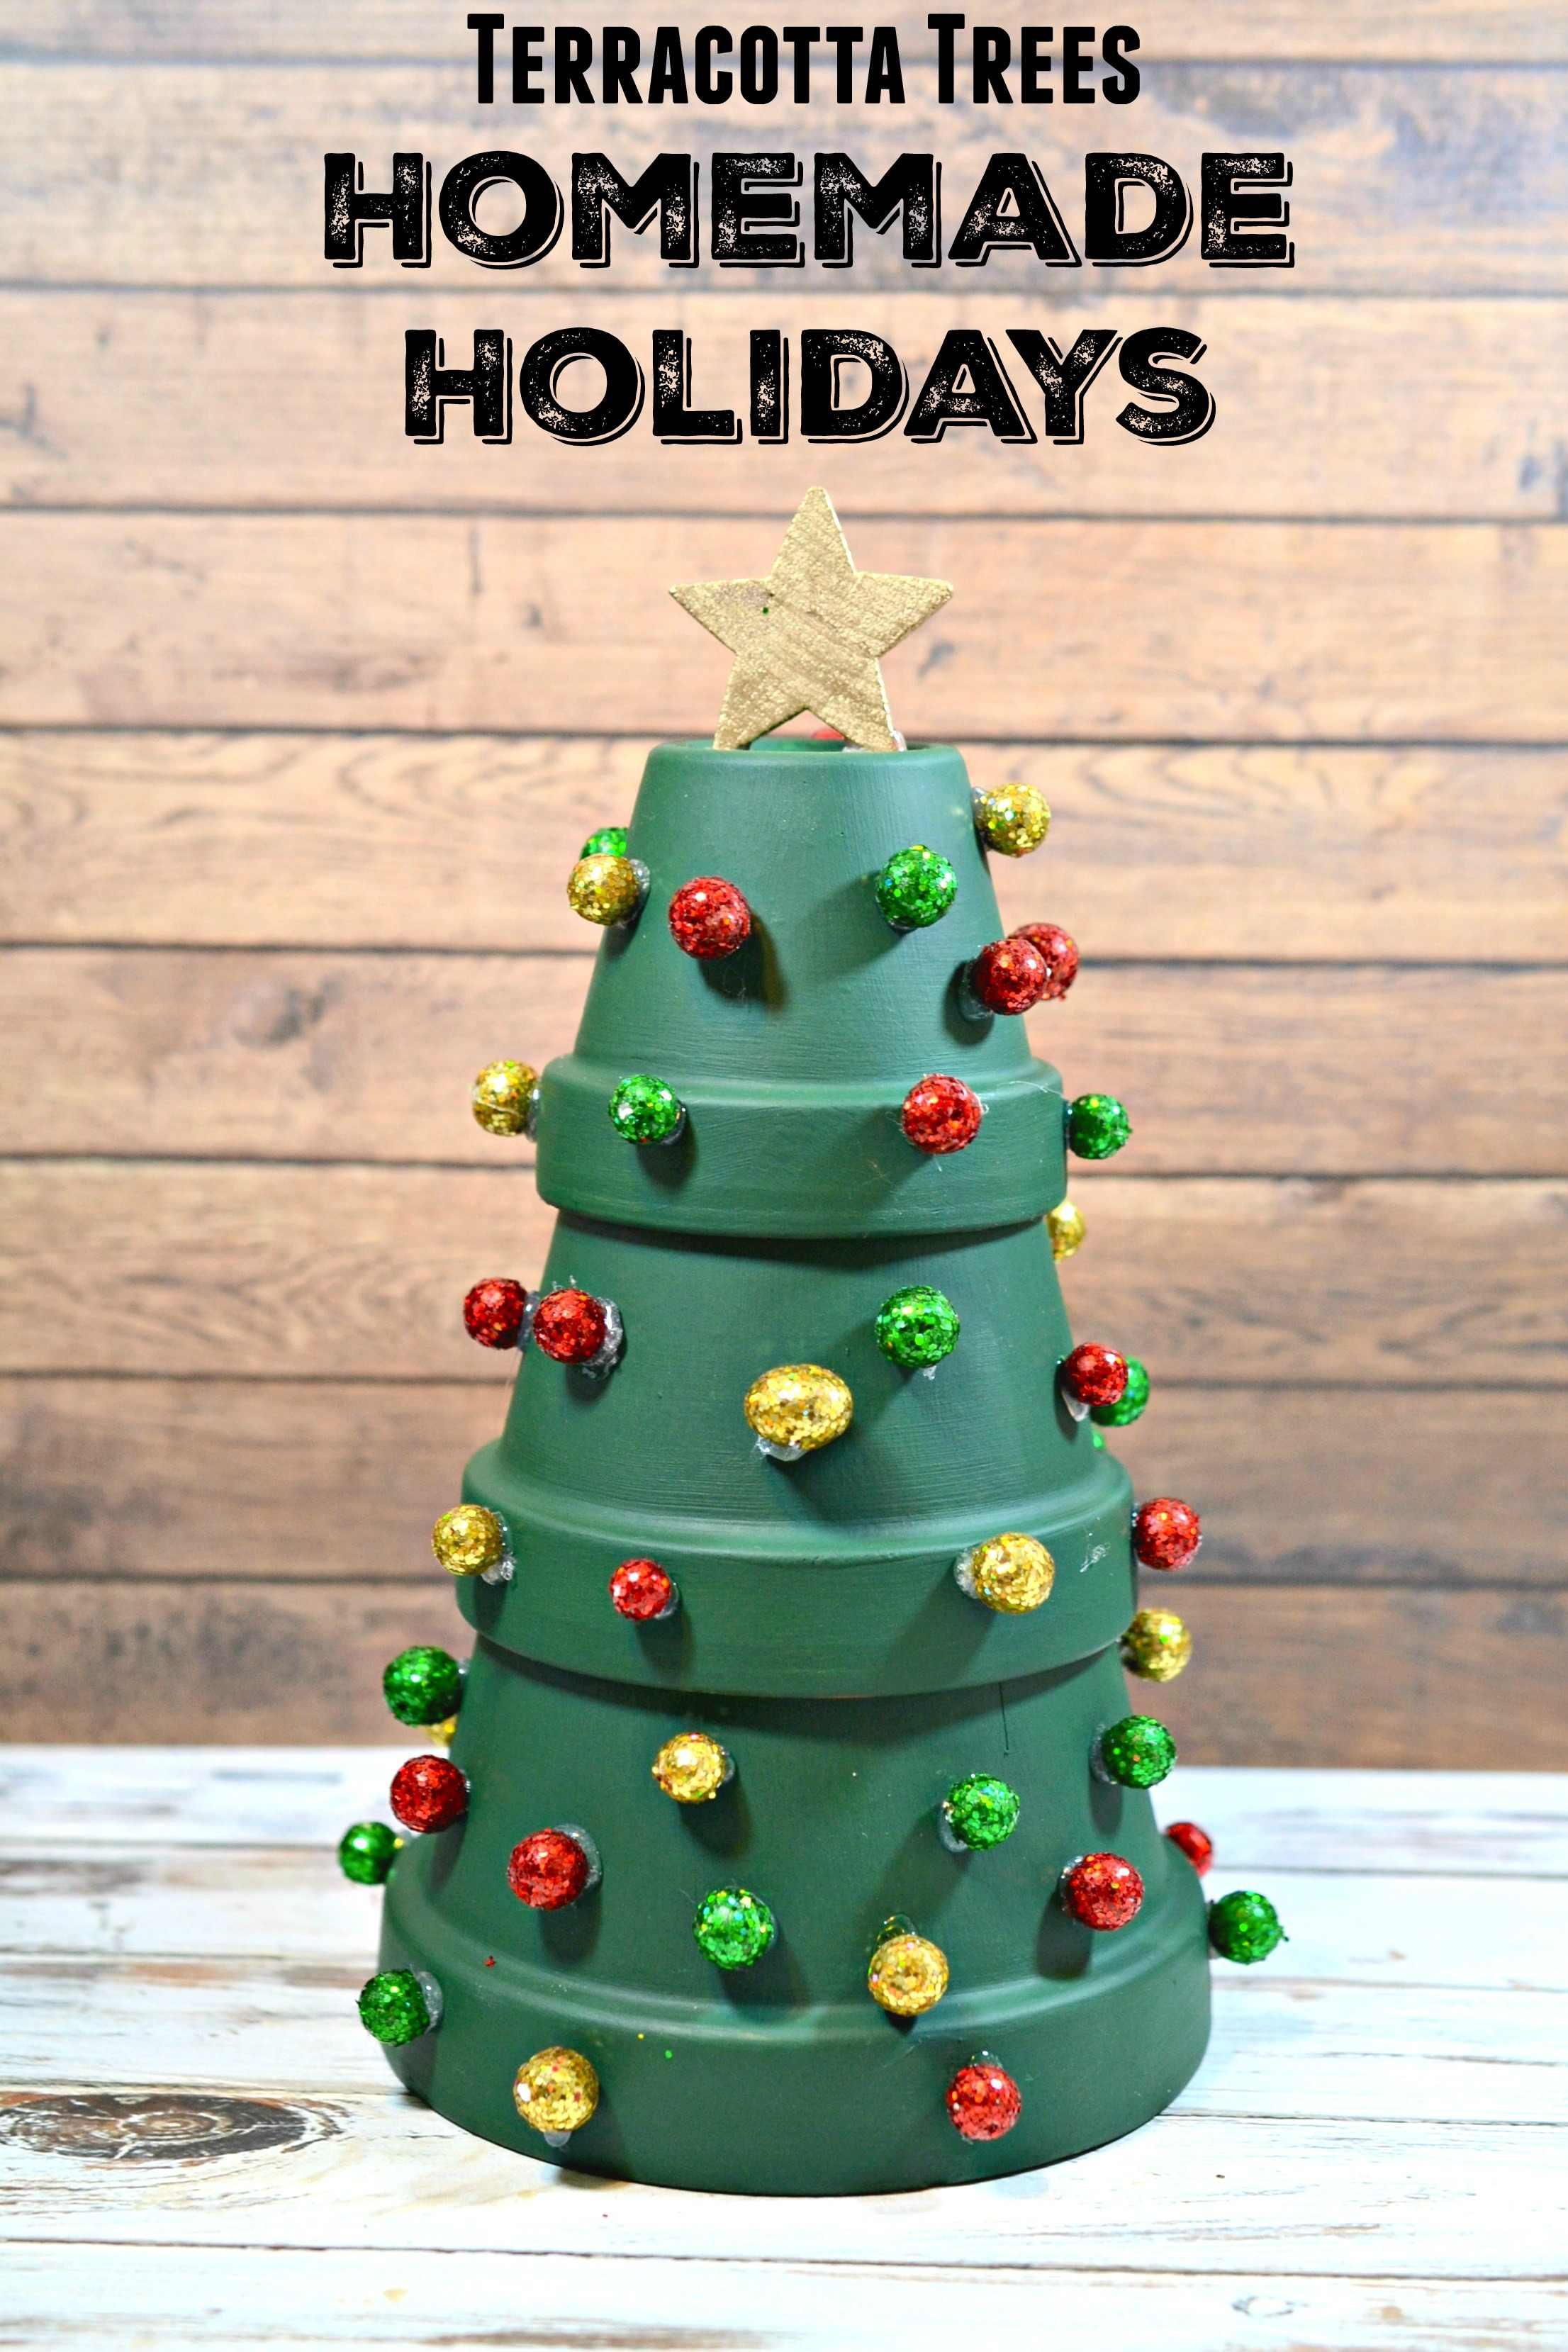 Terracotta Christmas Tree Holiday Home Decor